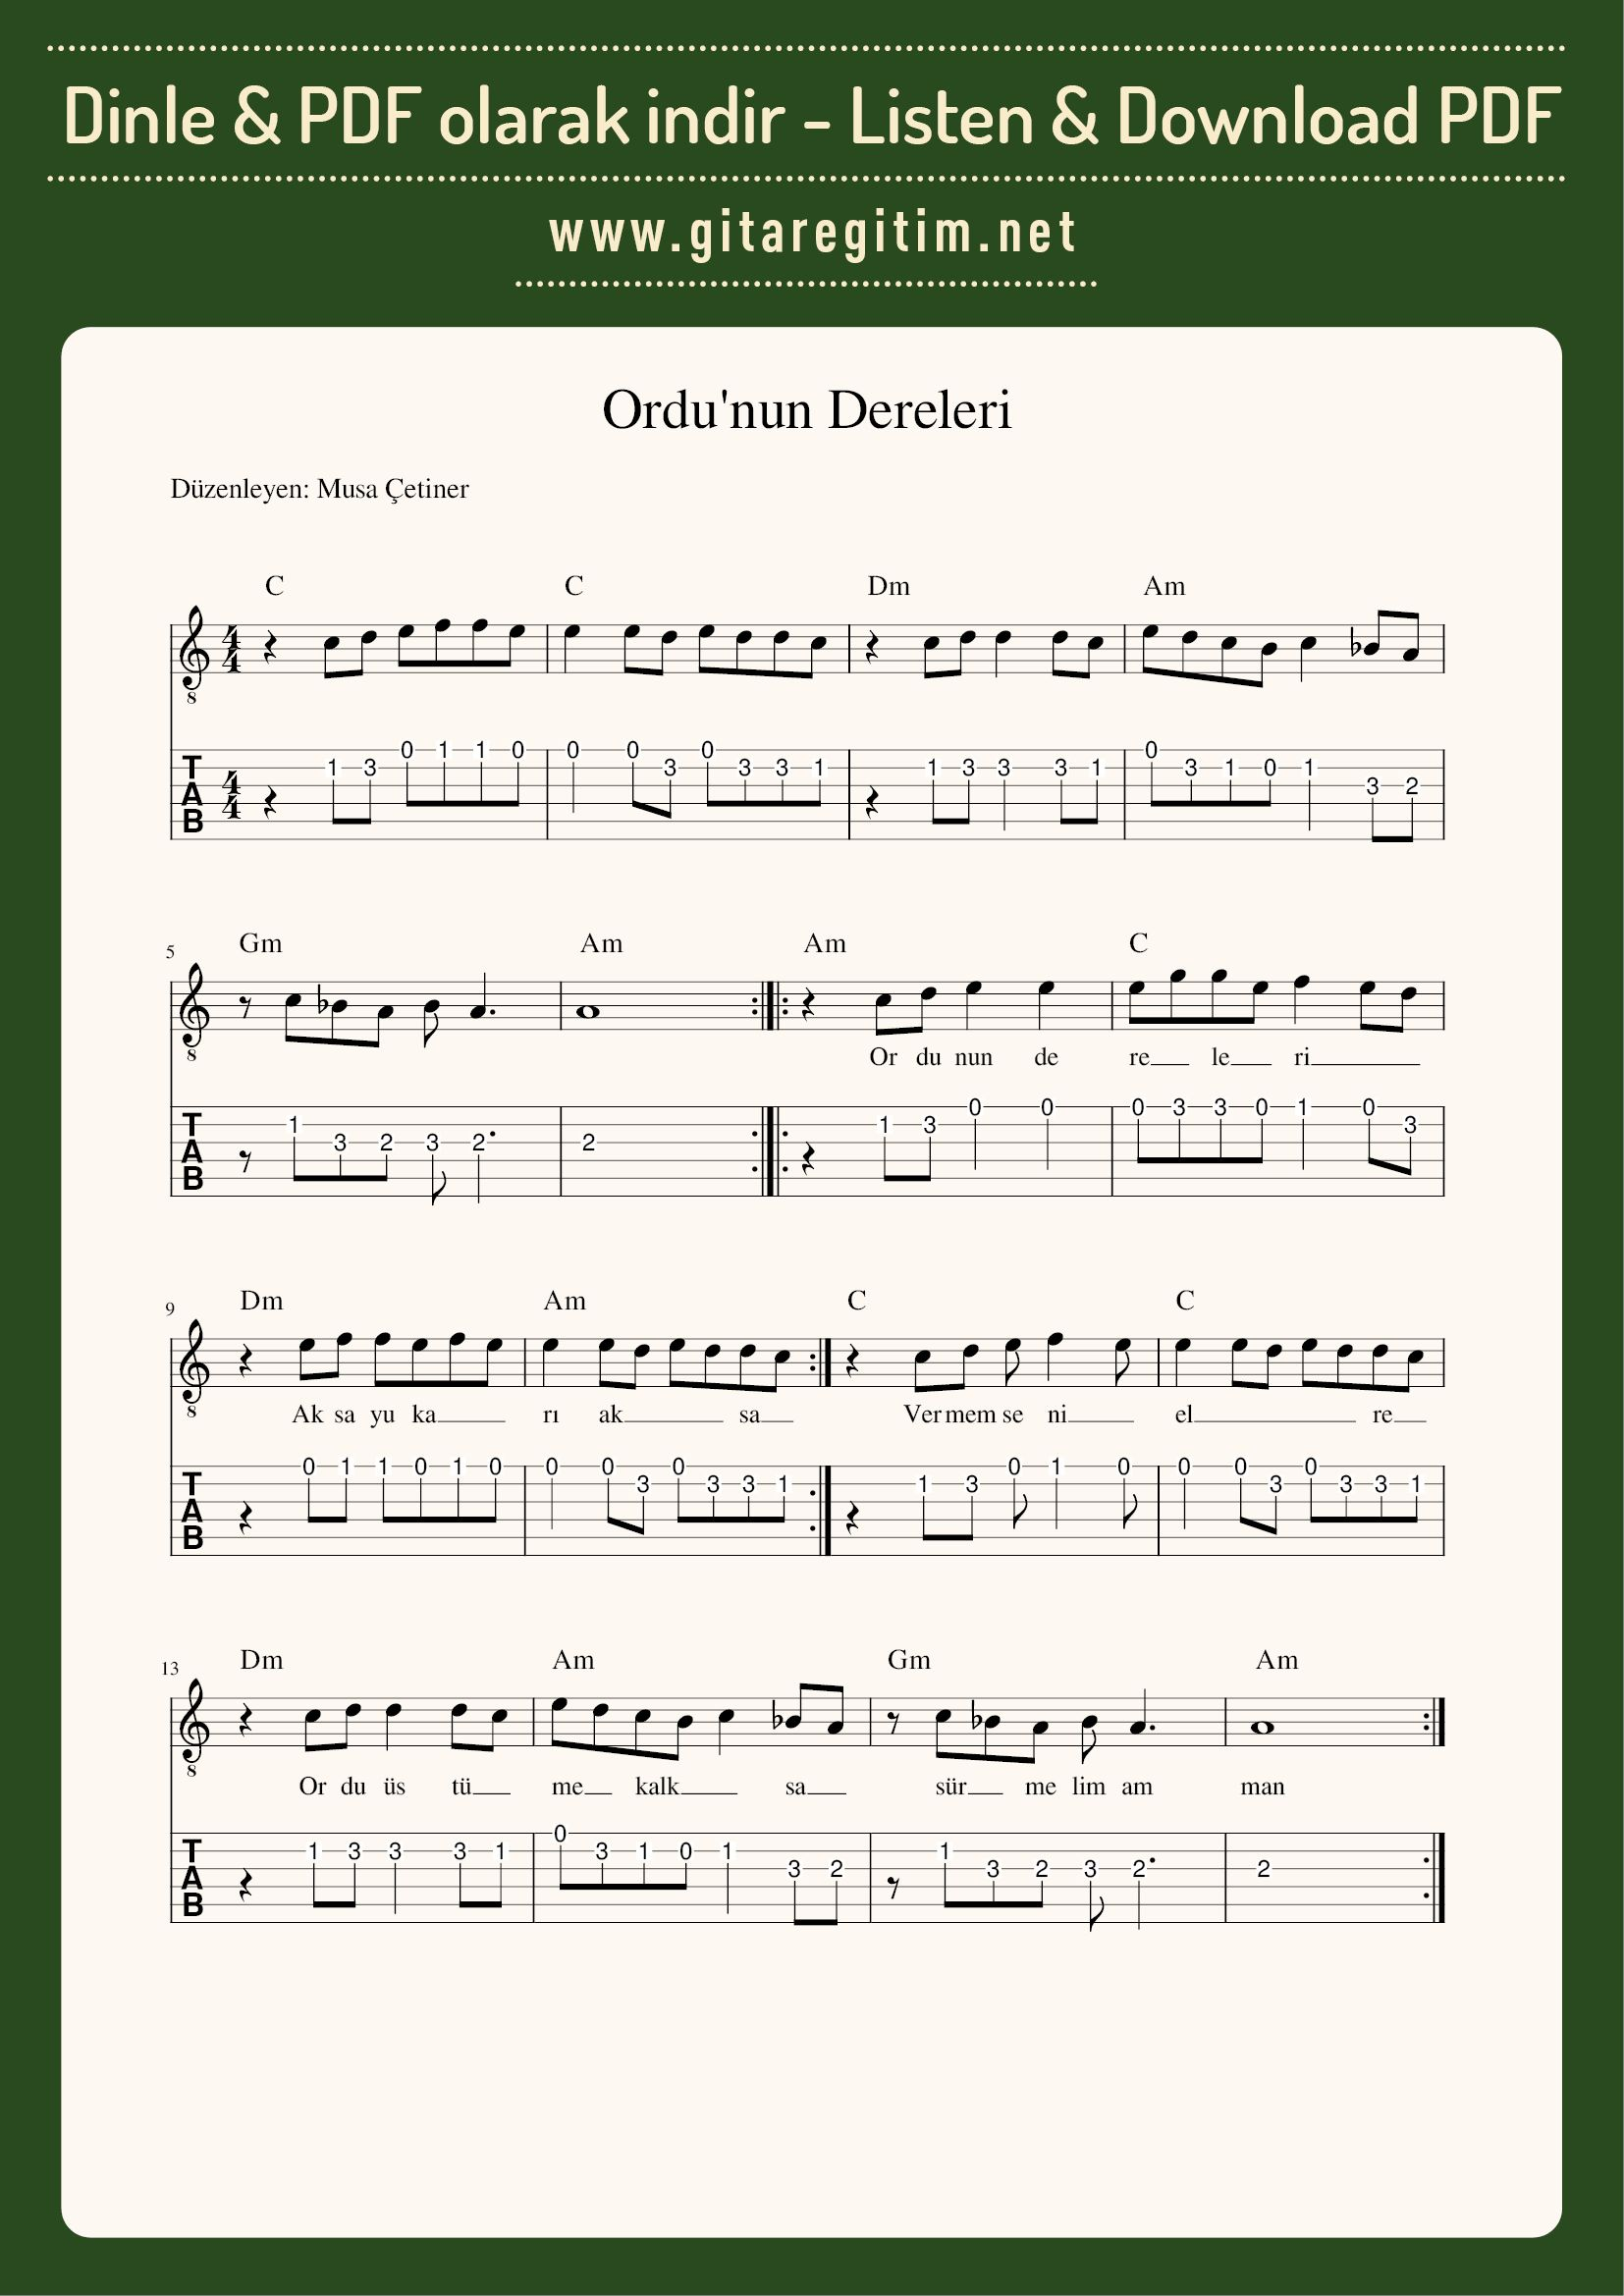 Ordu'nun Dereleri - Nota - Tab   #türkü #gitar#guitar #notalar #sheetmusic #gitaregitim #musaçetiner